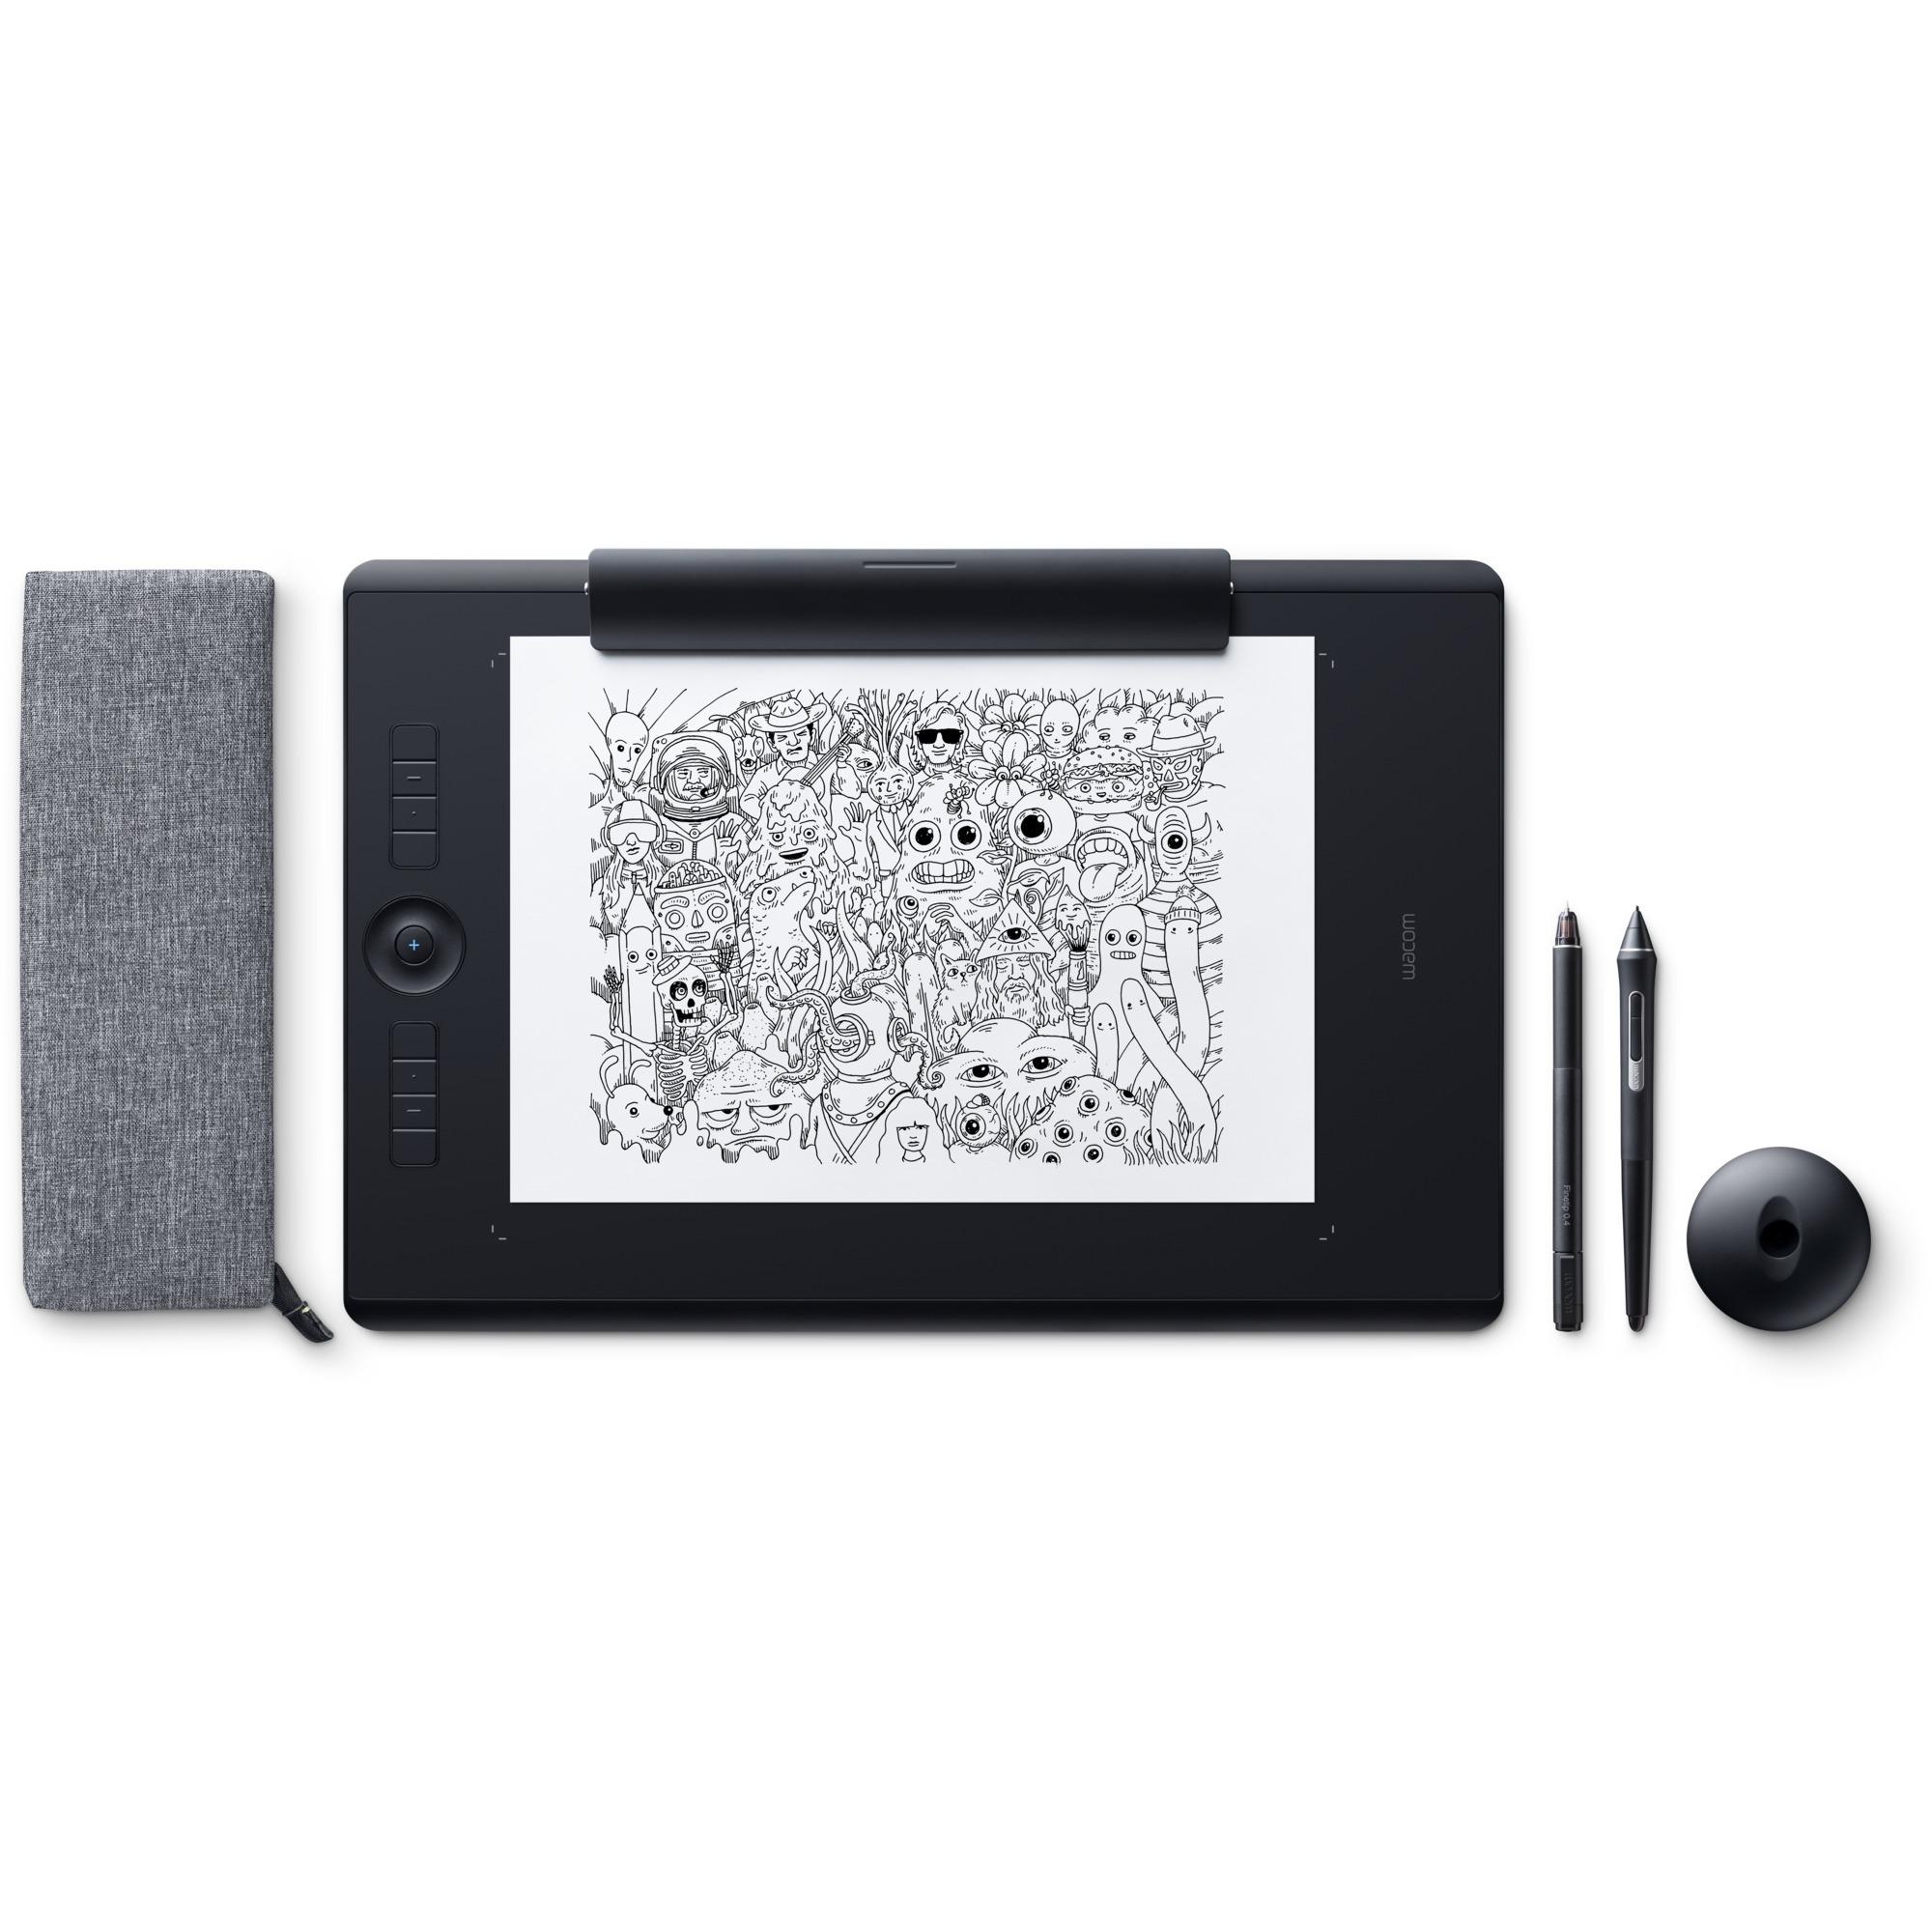 Intuos Pro Paper tableta digitalizadora 5080 líneas por pulgada 311 x 216 mm USB/Bluetooth Negro, Tableta gráfica